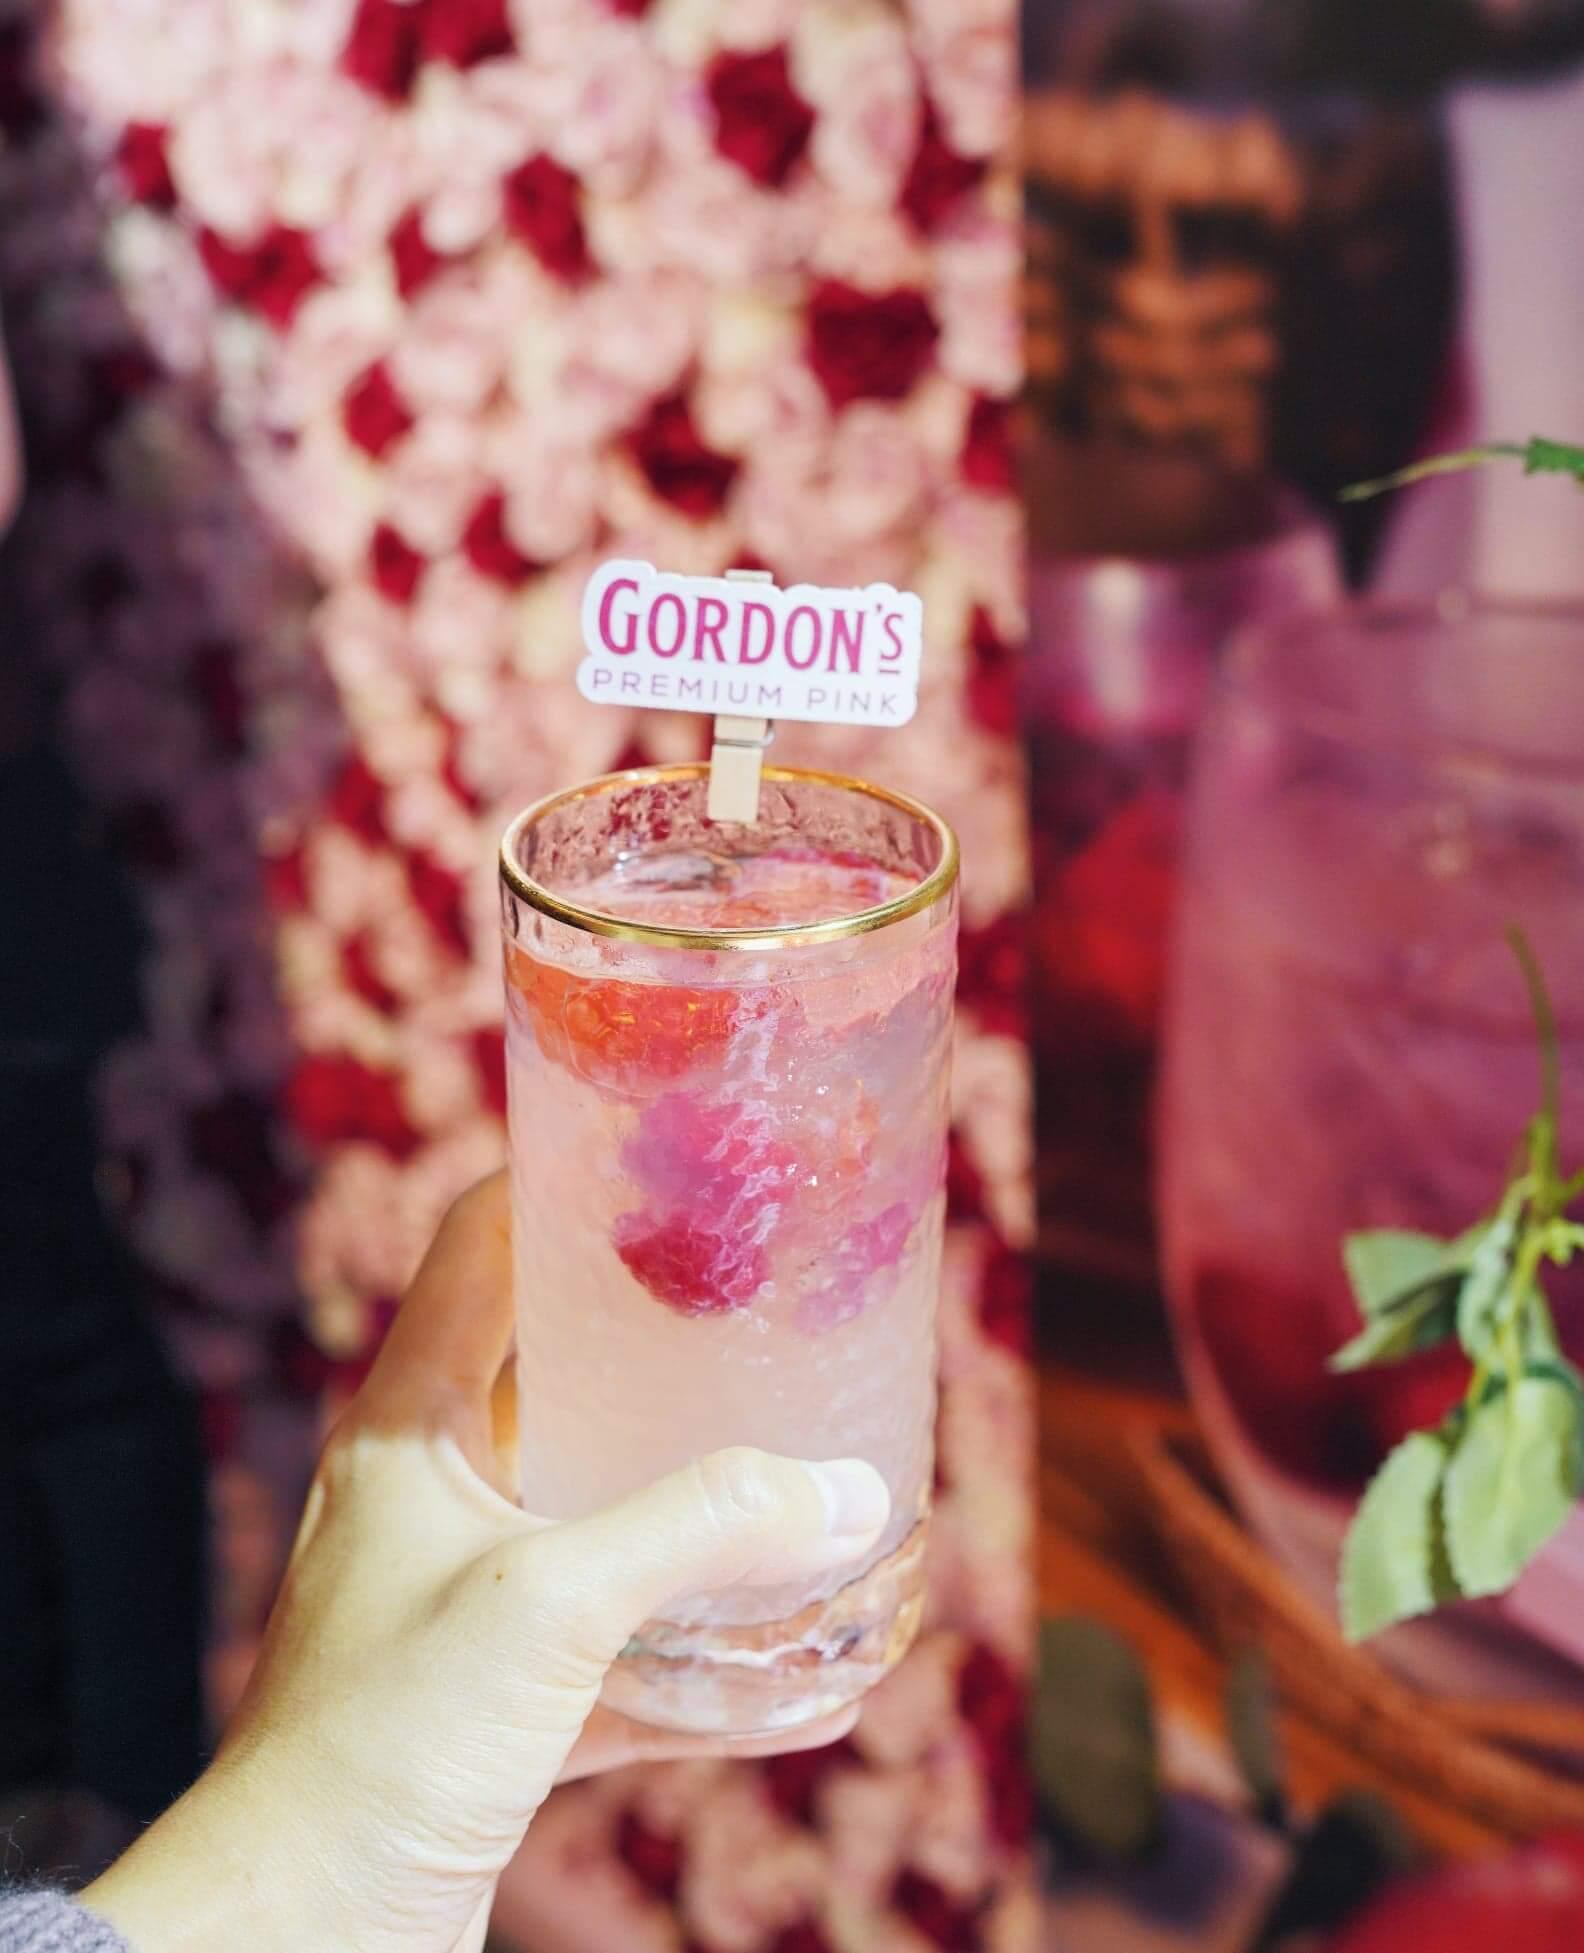 Gordon's Pink Lemonade HK$98